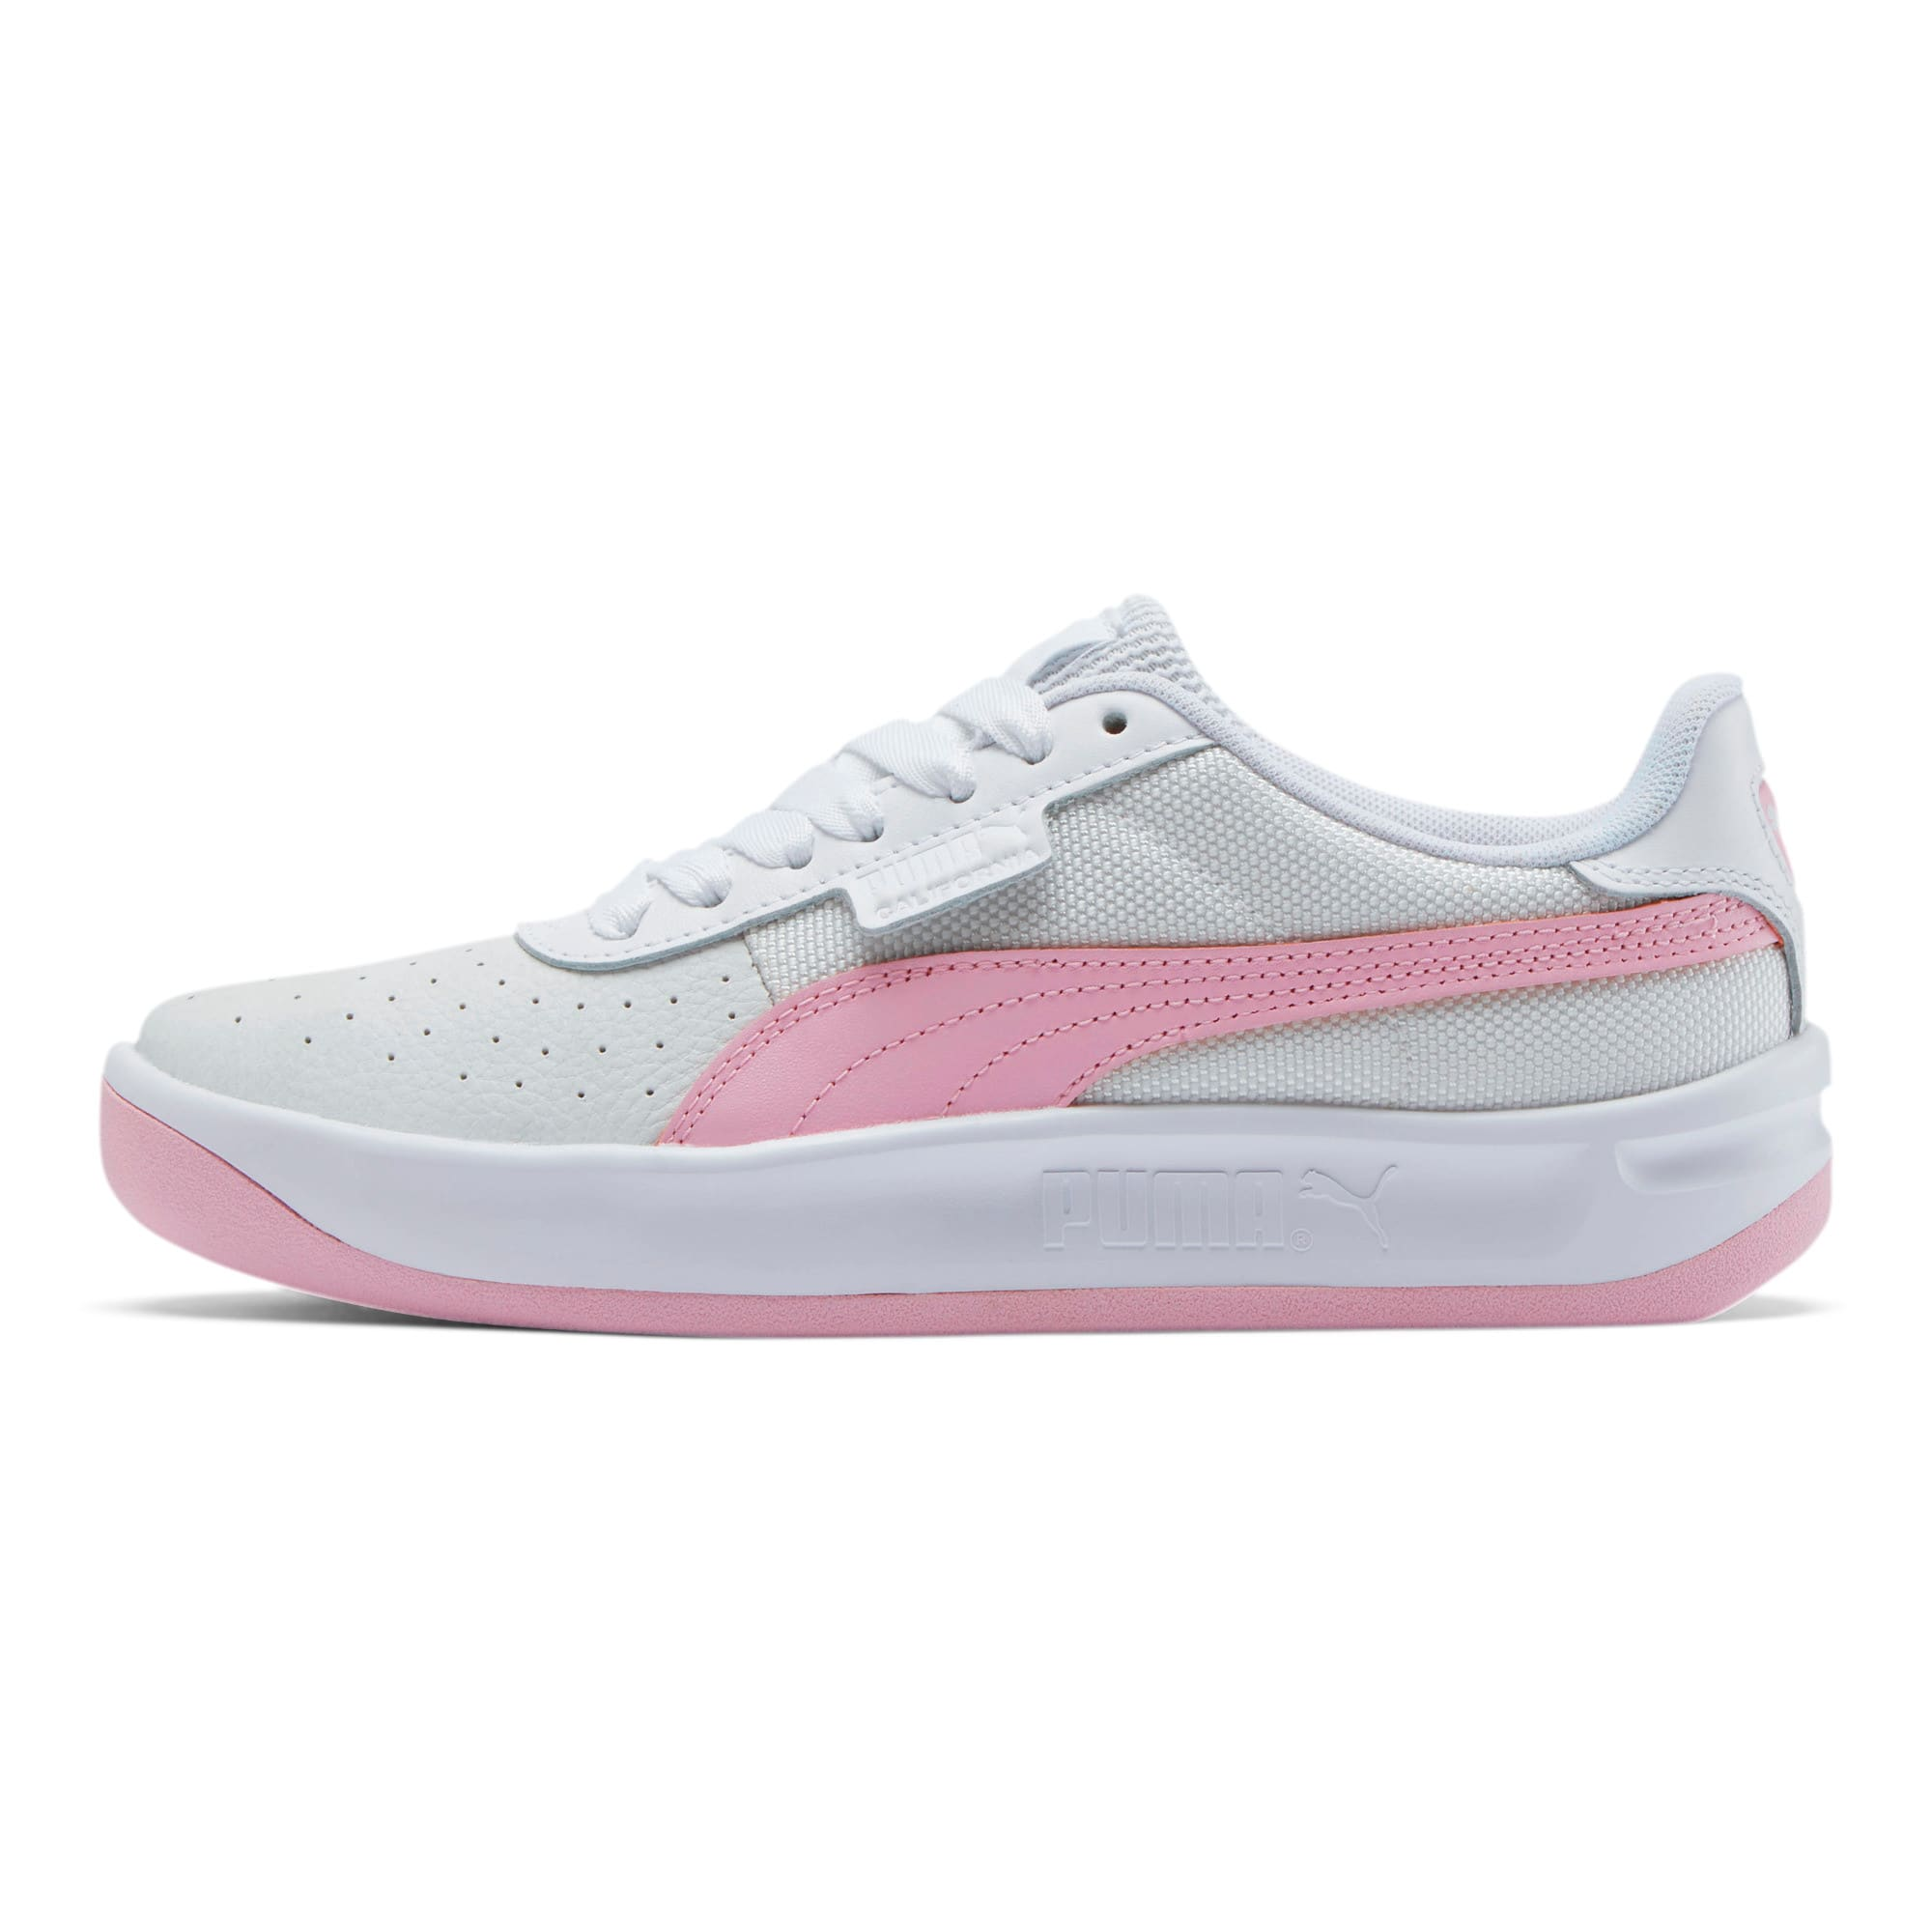 Thumbnail 1 of California Women's Sneakers, Puma Wht-Pale Pink-Puma Wht, medium